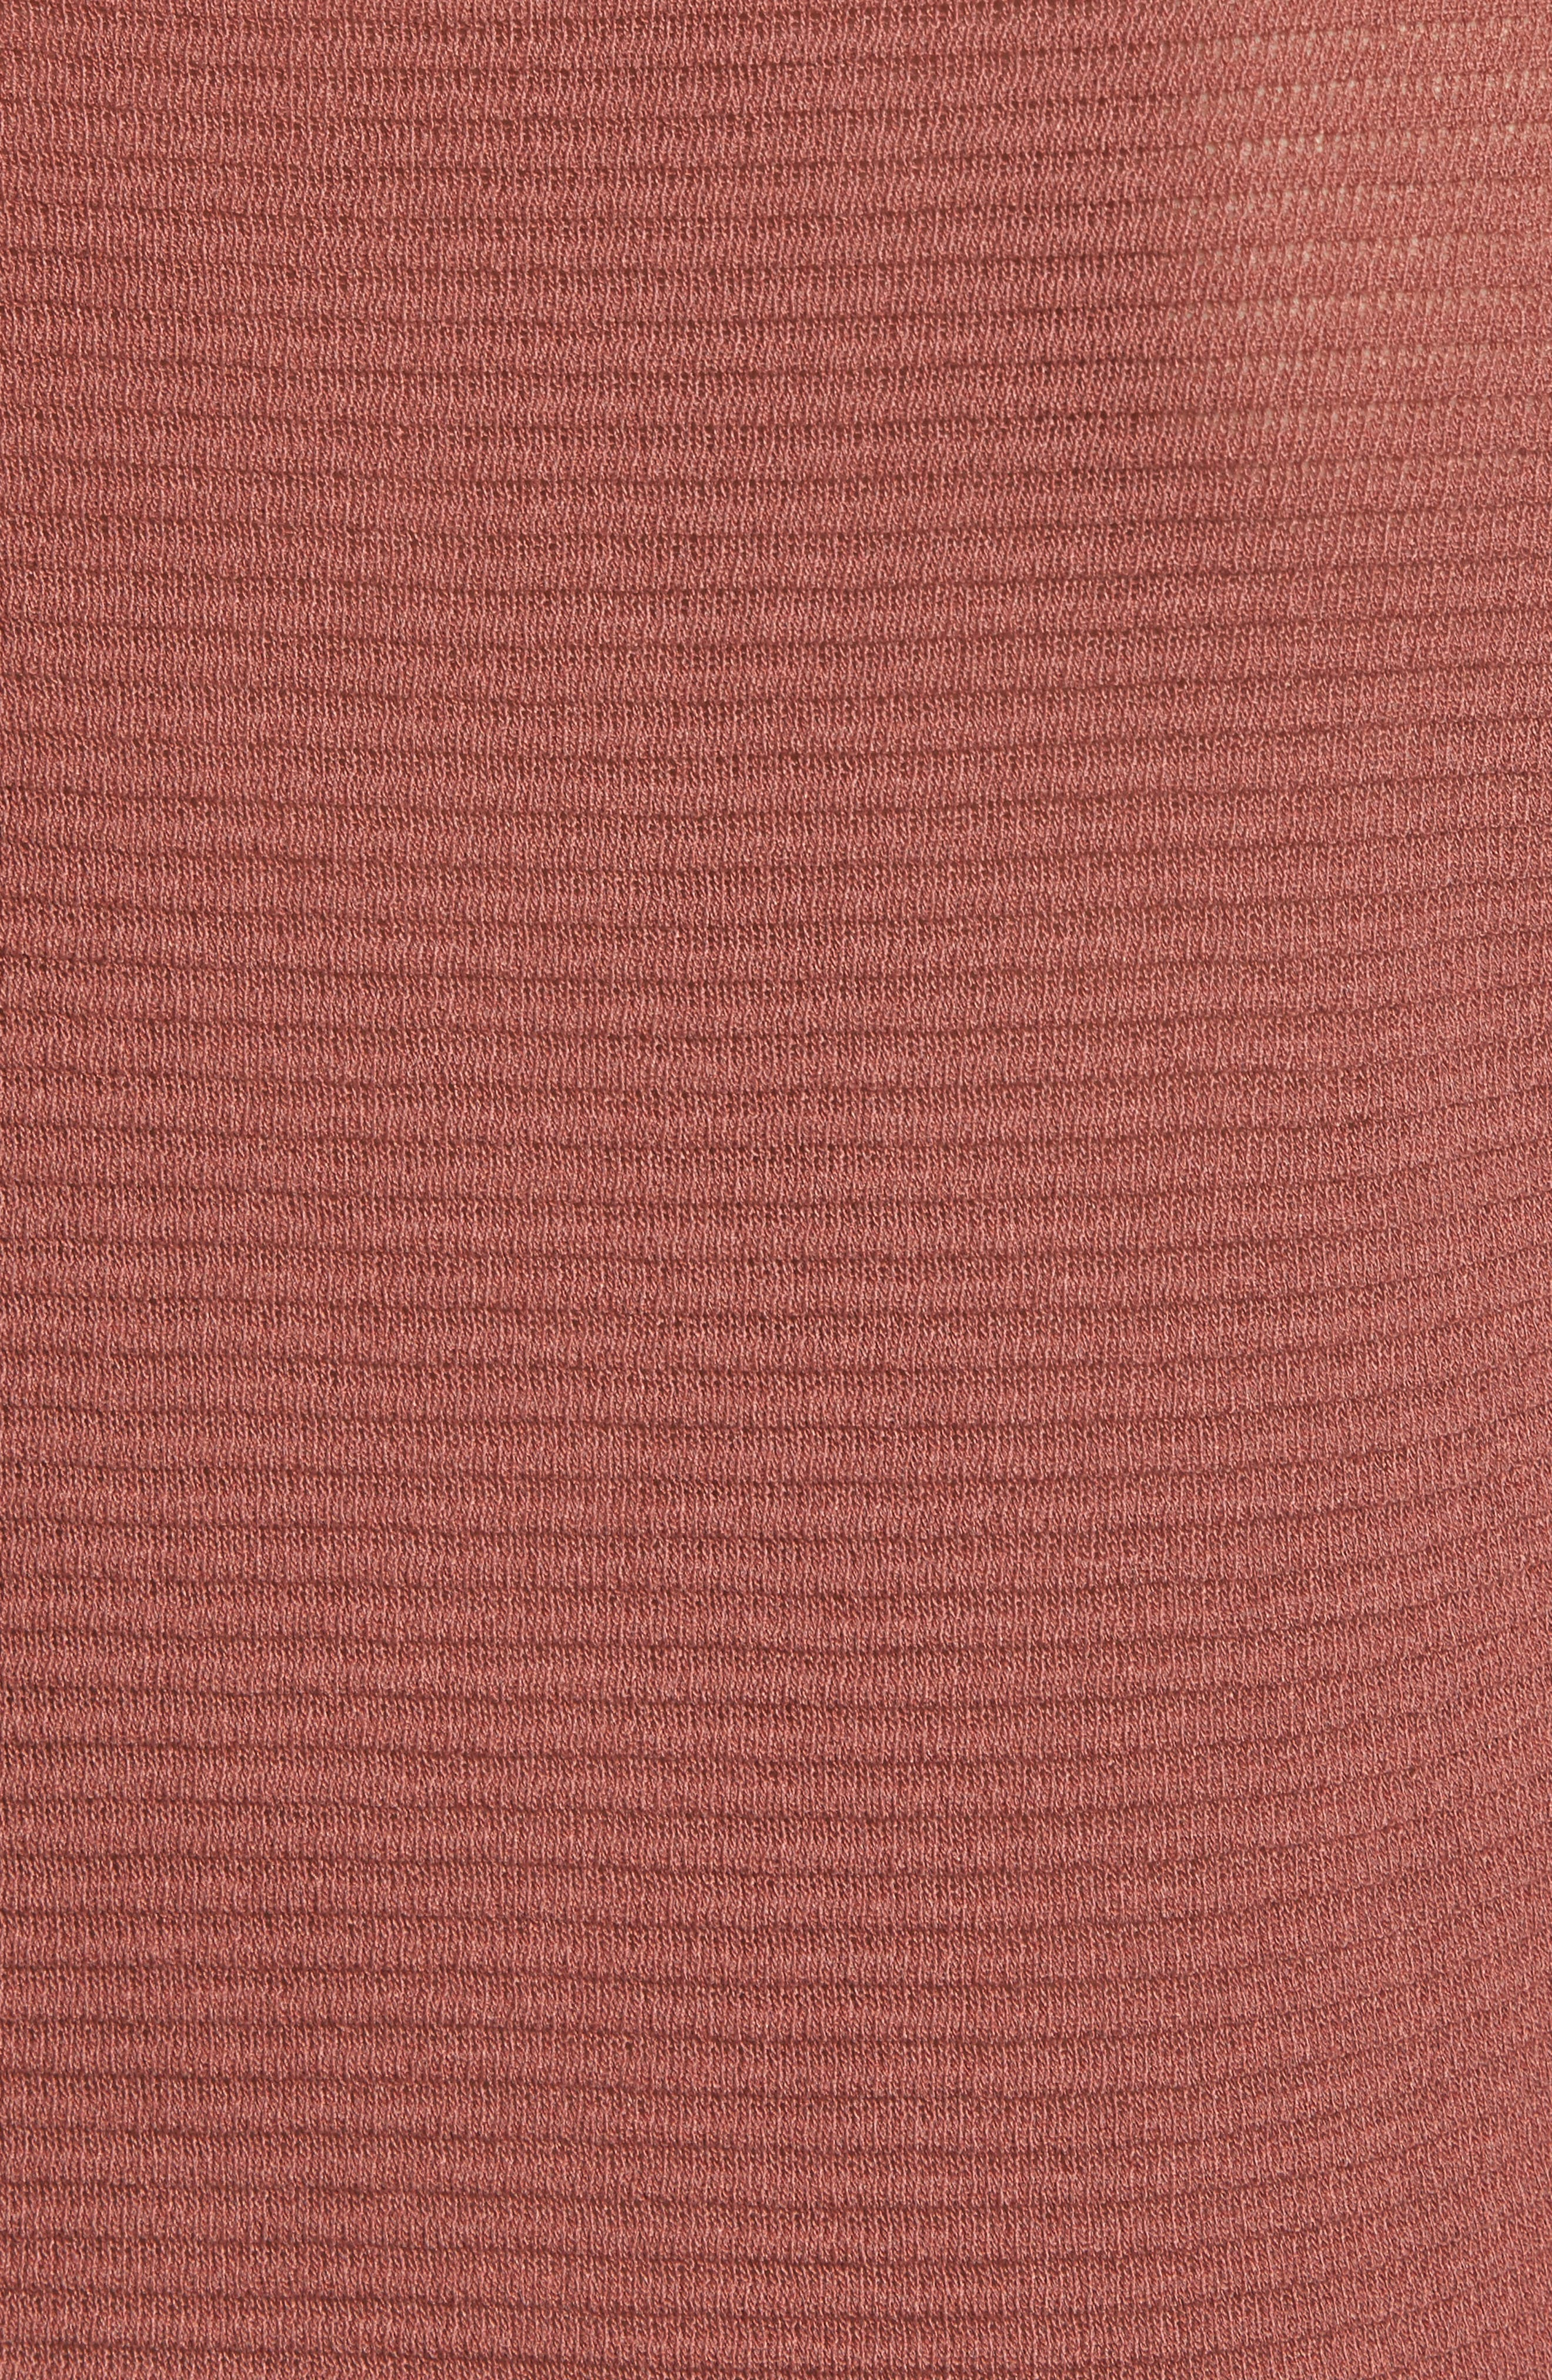 Ribbed Sweatshirt,                             Alternate thumbnail 5, color,                             240